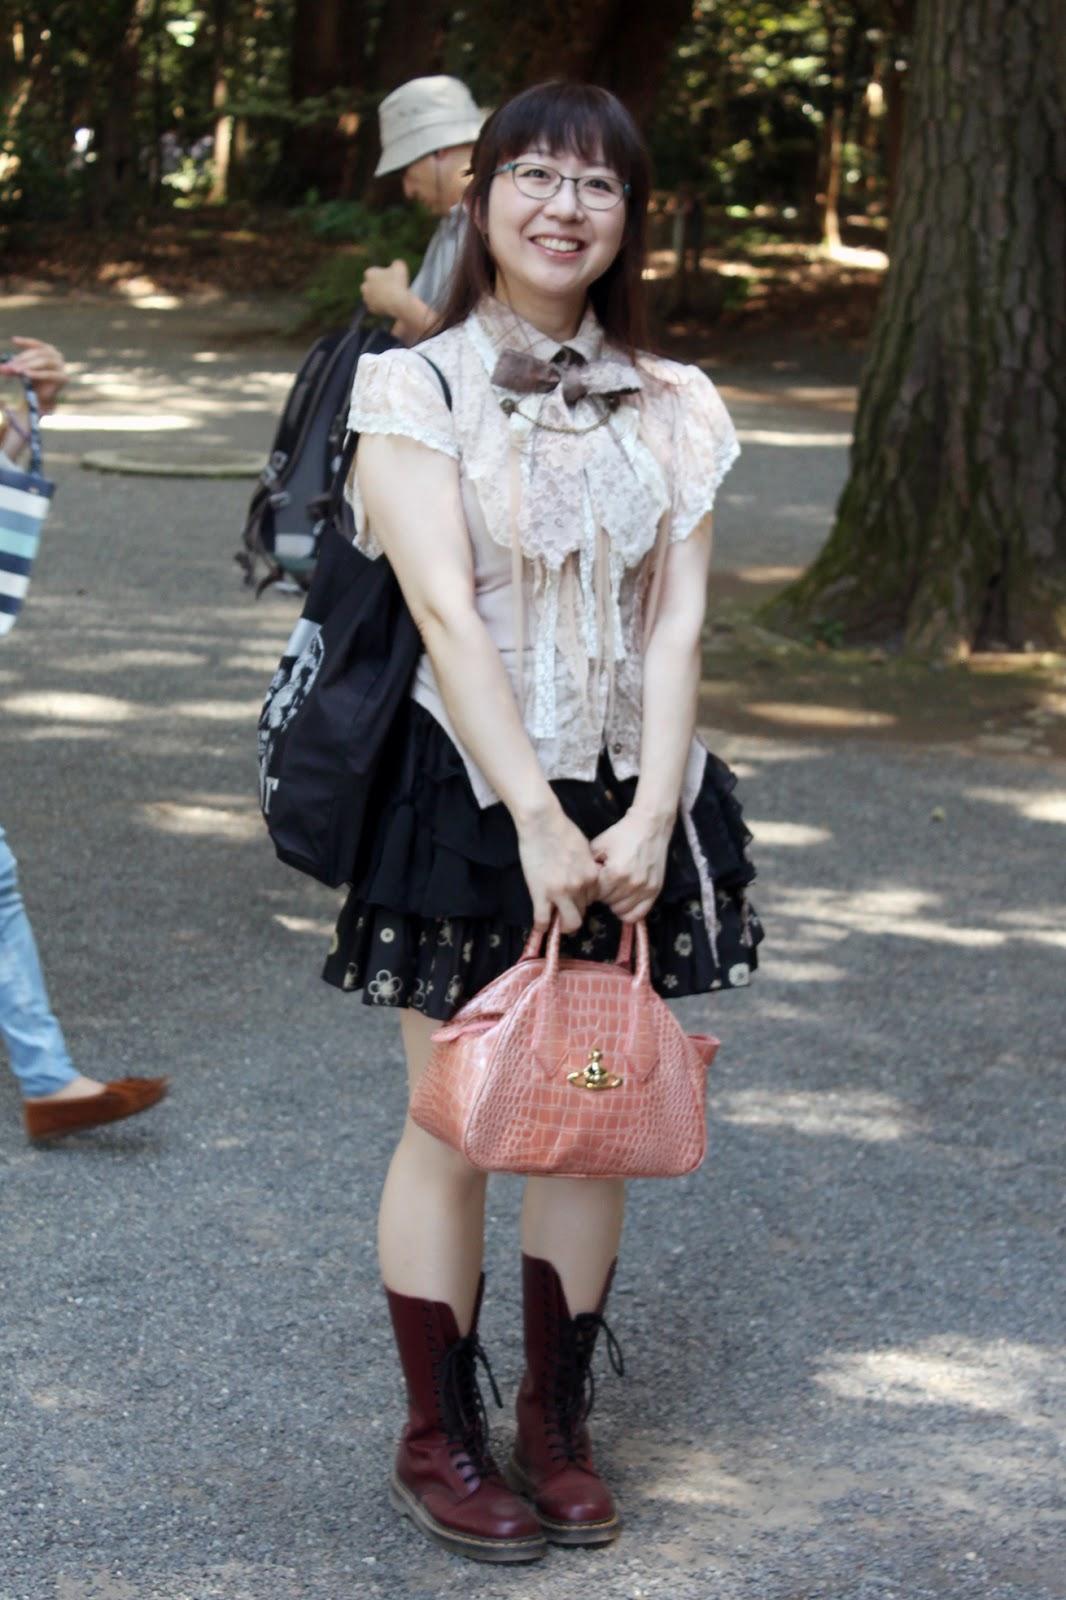 Victoriana Lolita subculture style, Harajuku style, Tokyo streetstyle